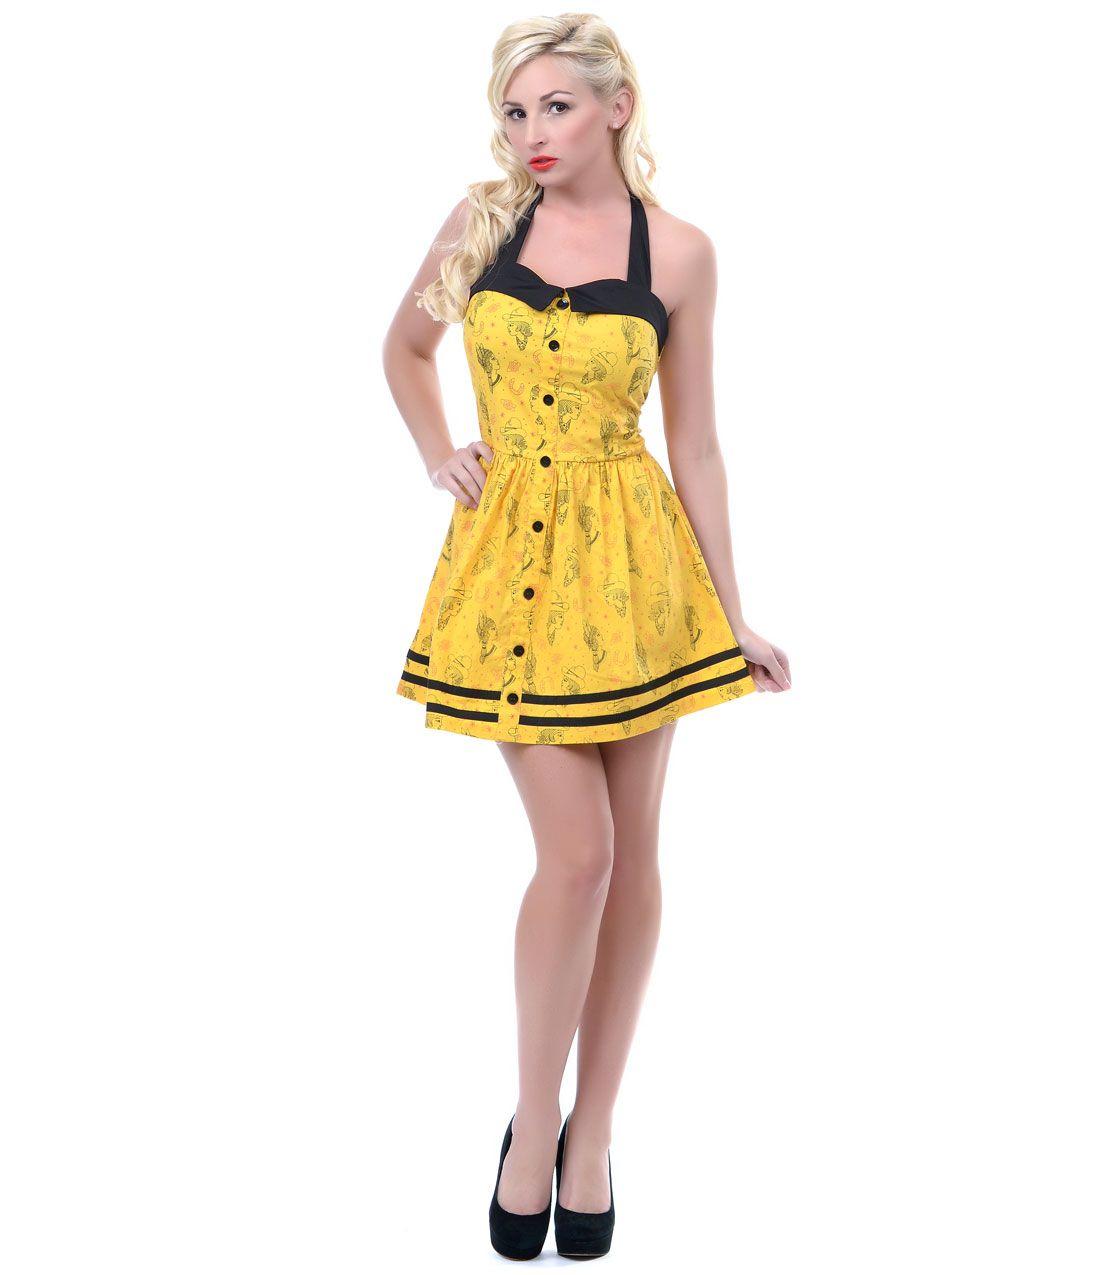 Yellow Wild West Halter Dress - Unique Vintage - Prom dresses, retro dresses, retro swimsuits.